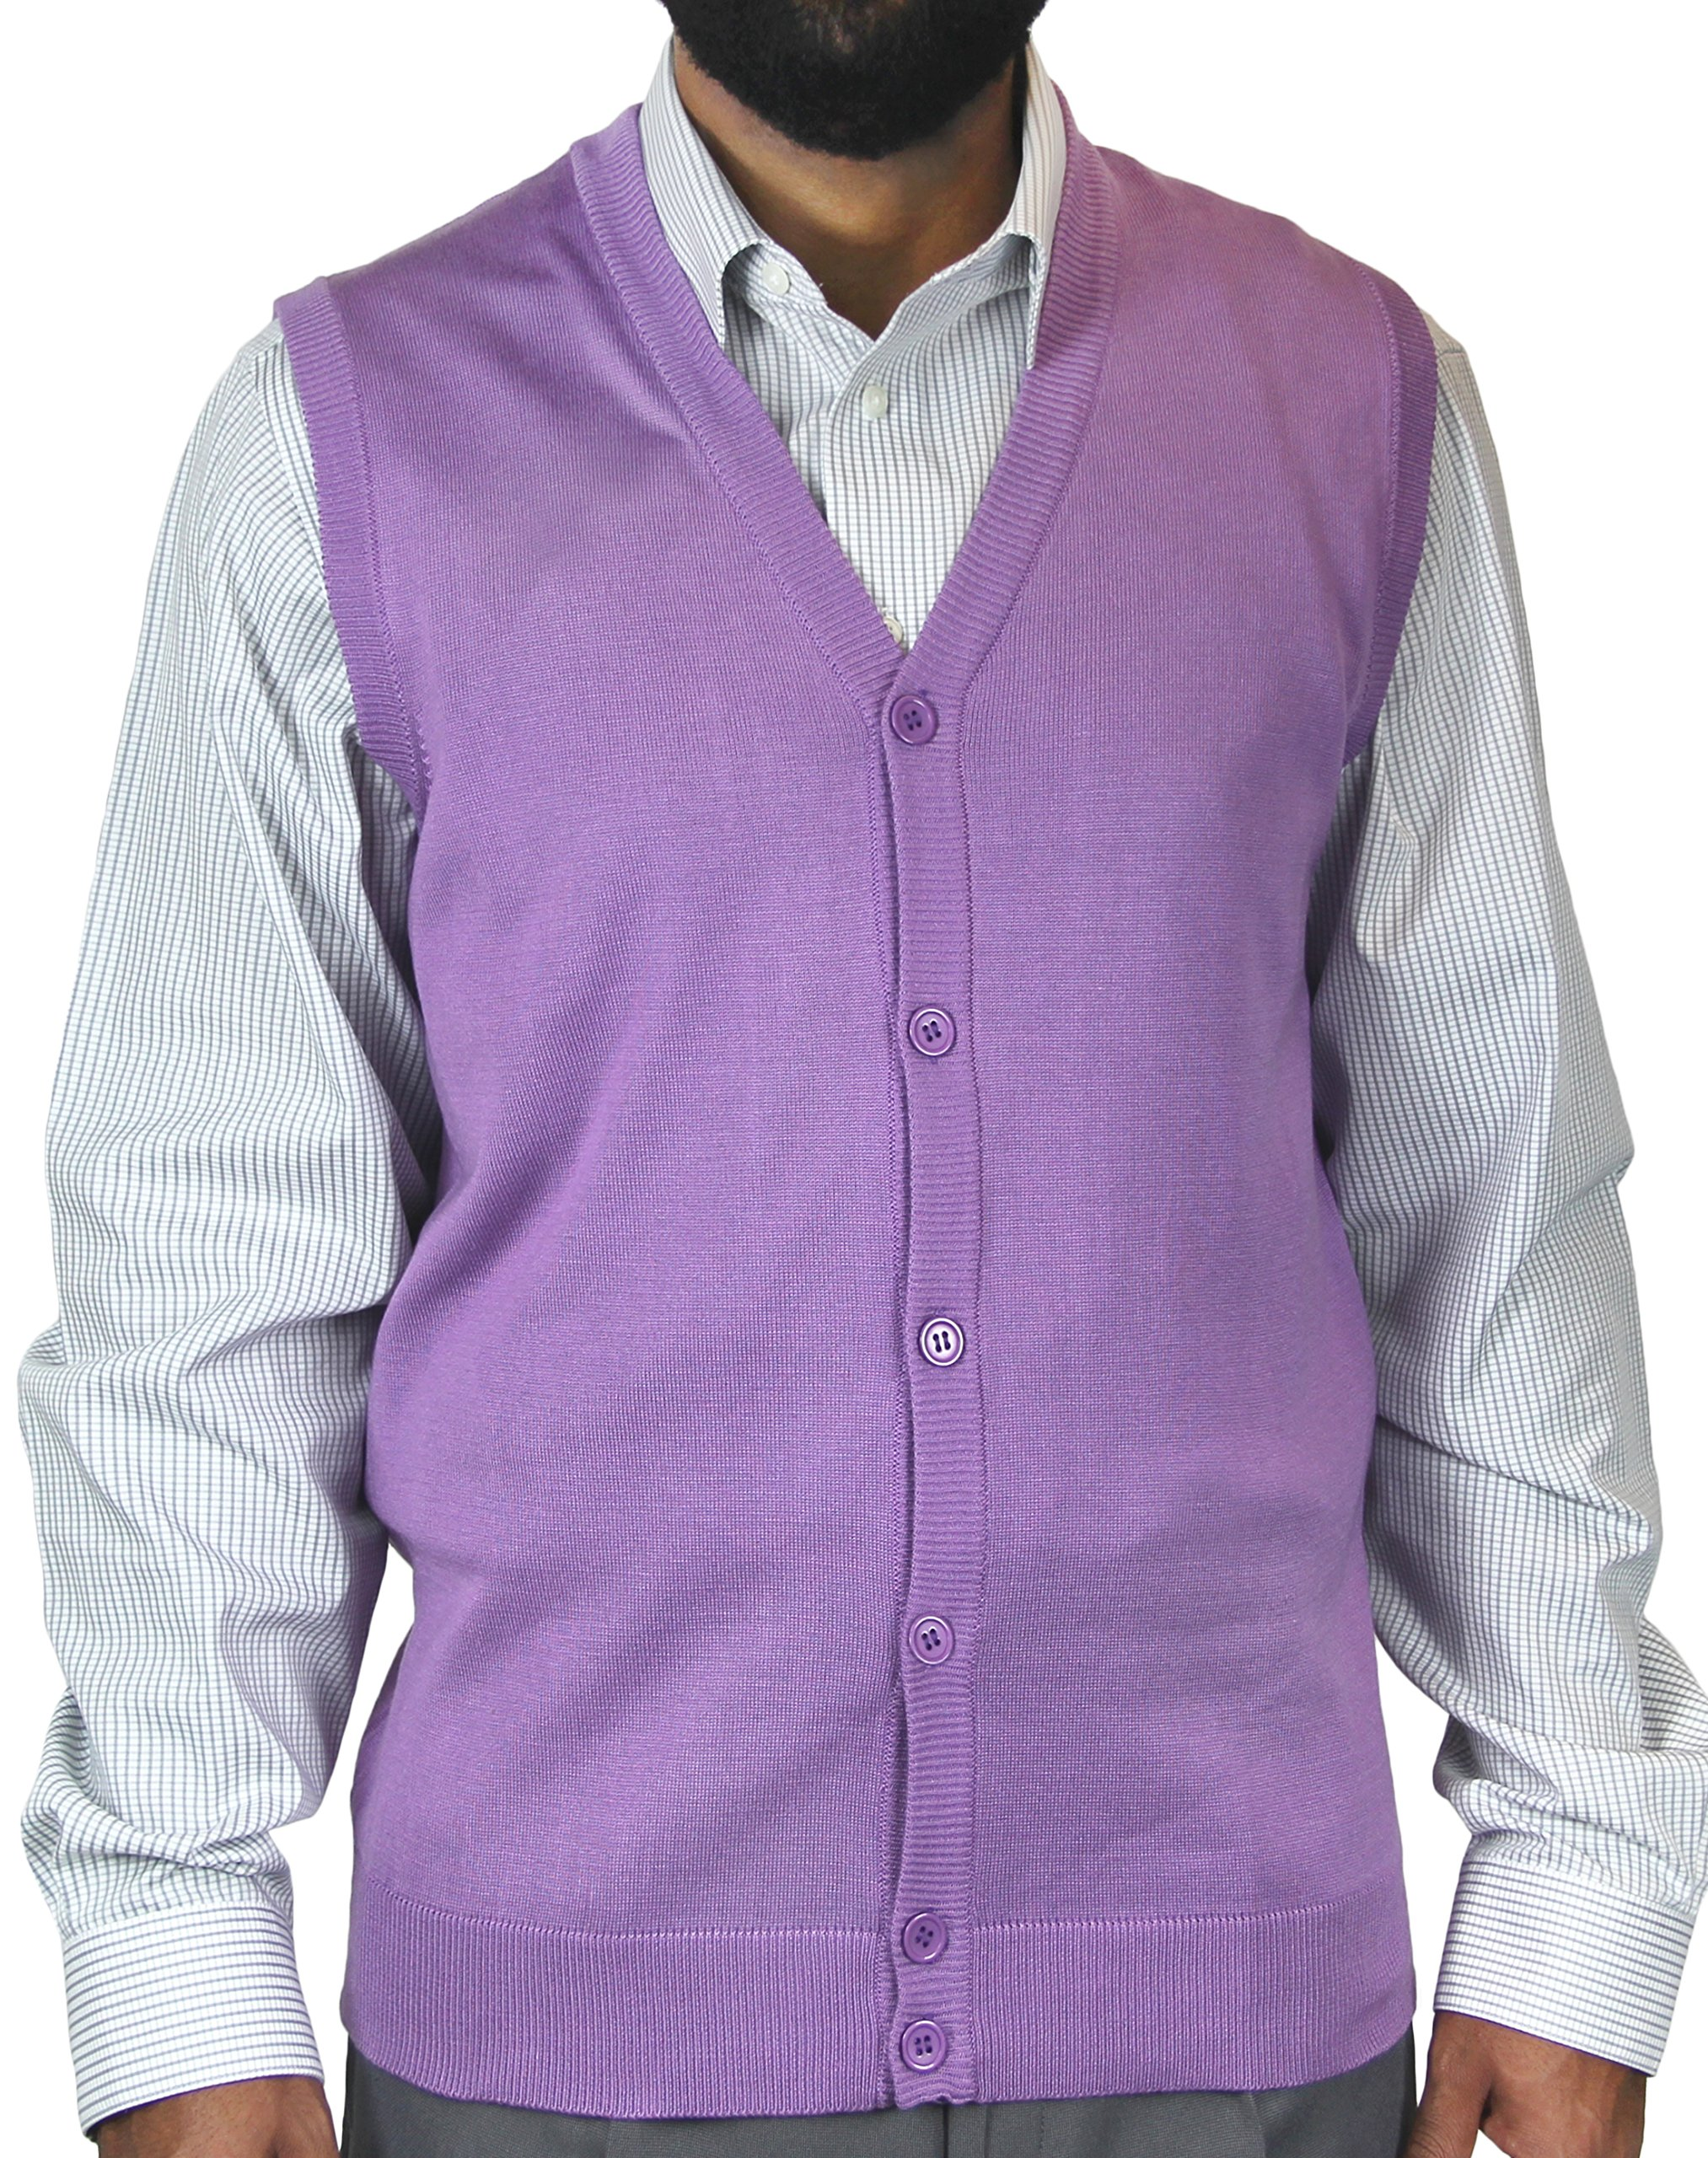 Blue Ocean Solid Color Cardigan Sweater Vest-2X-Large